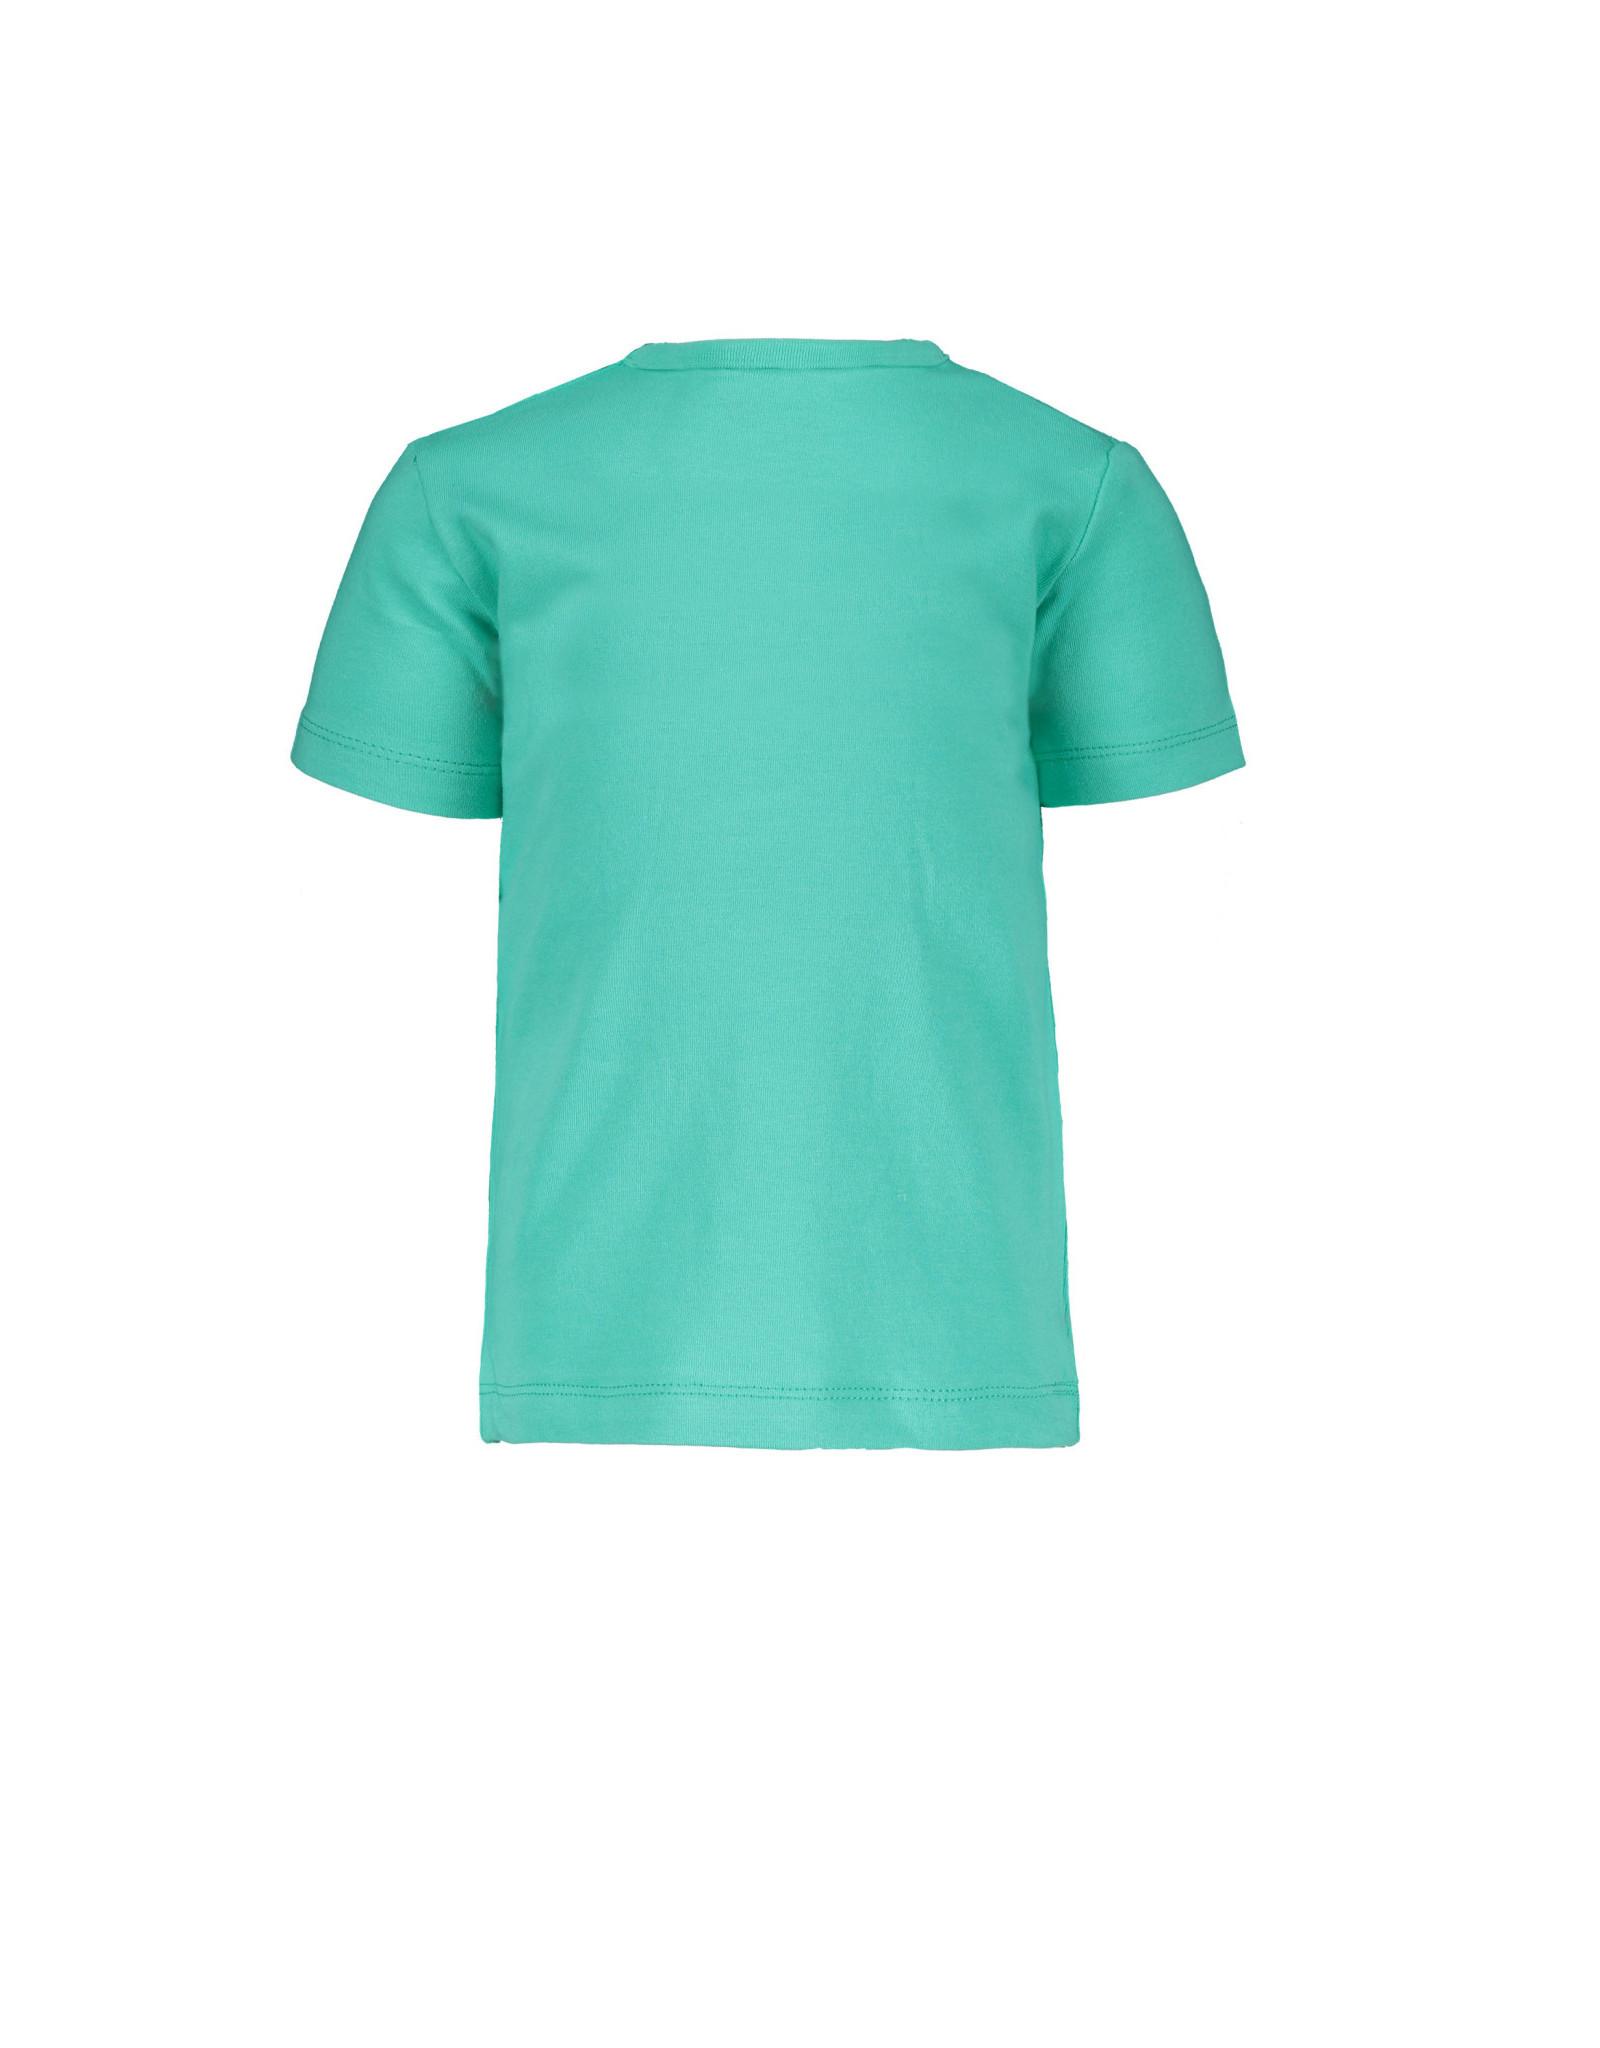 Bampidano Bampidano jongens t-shirt Enzo Green